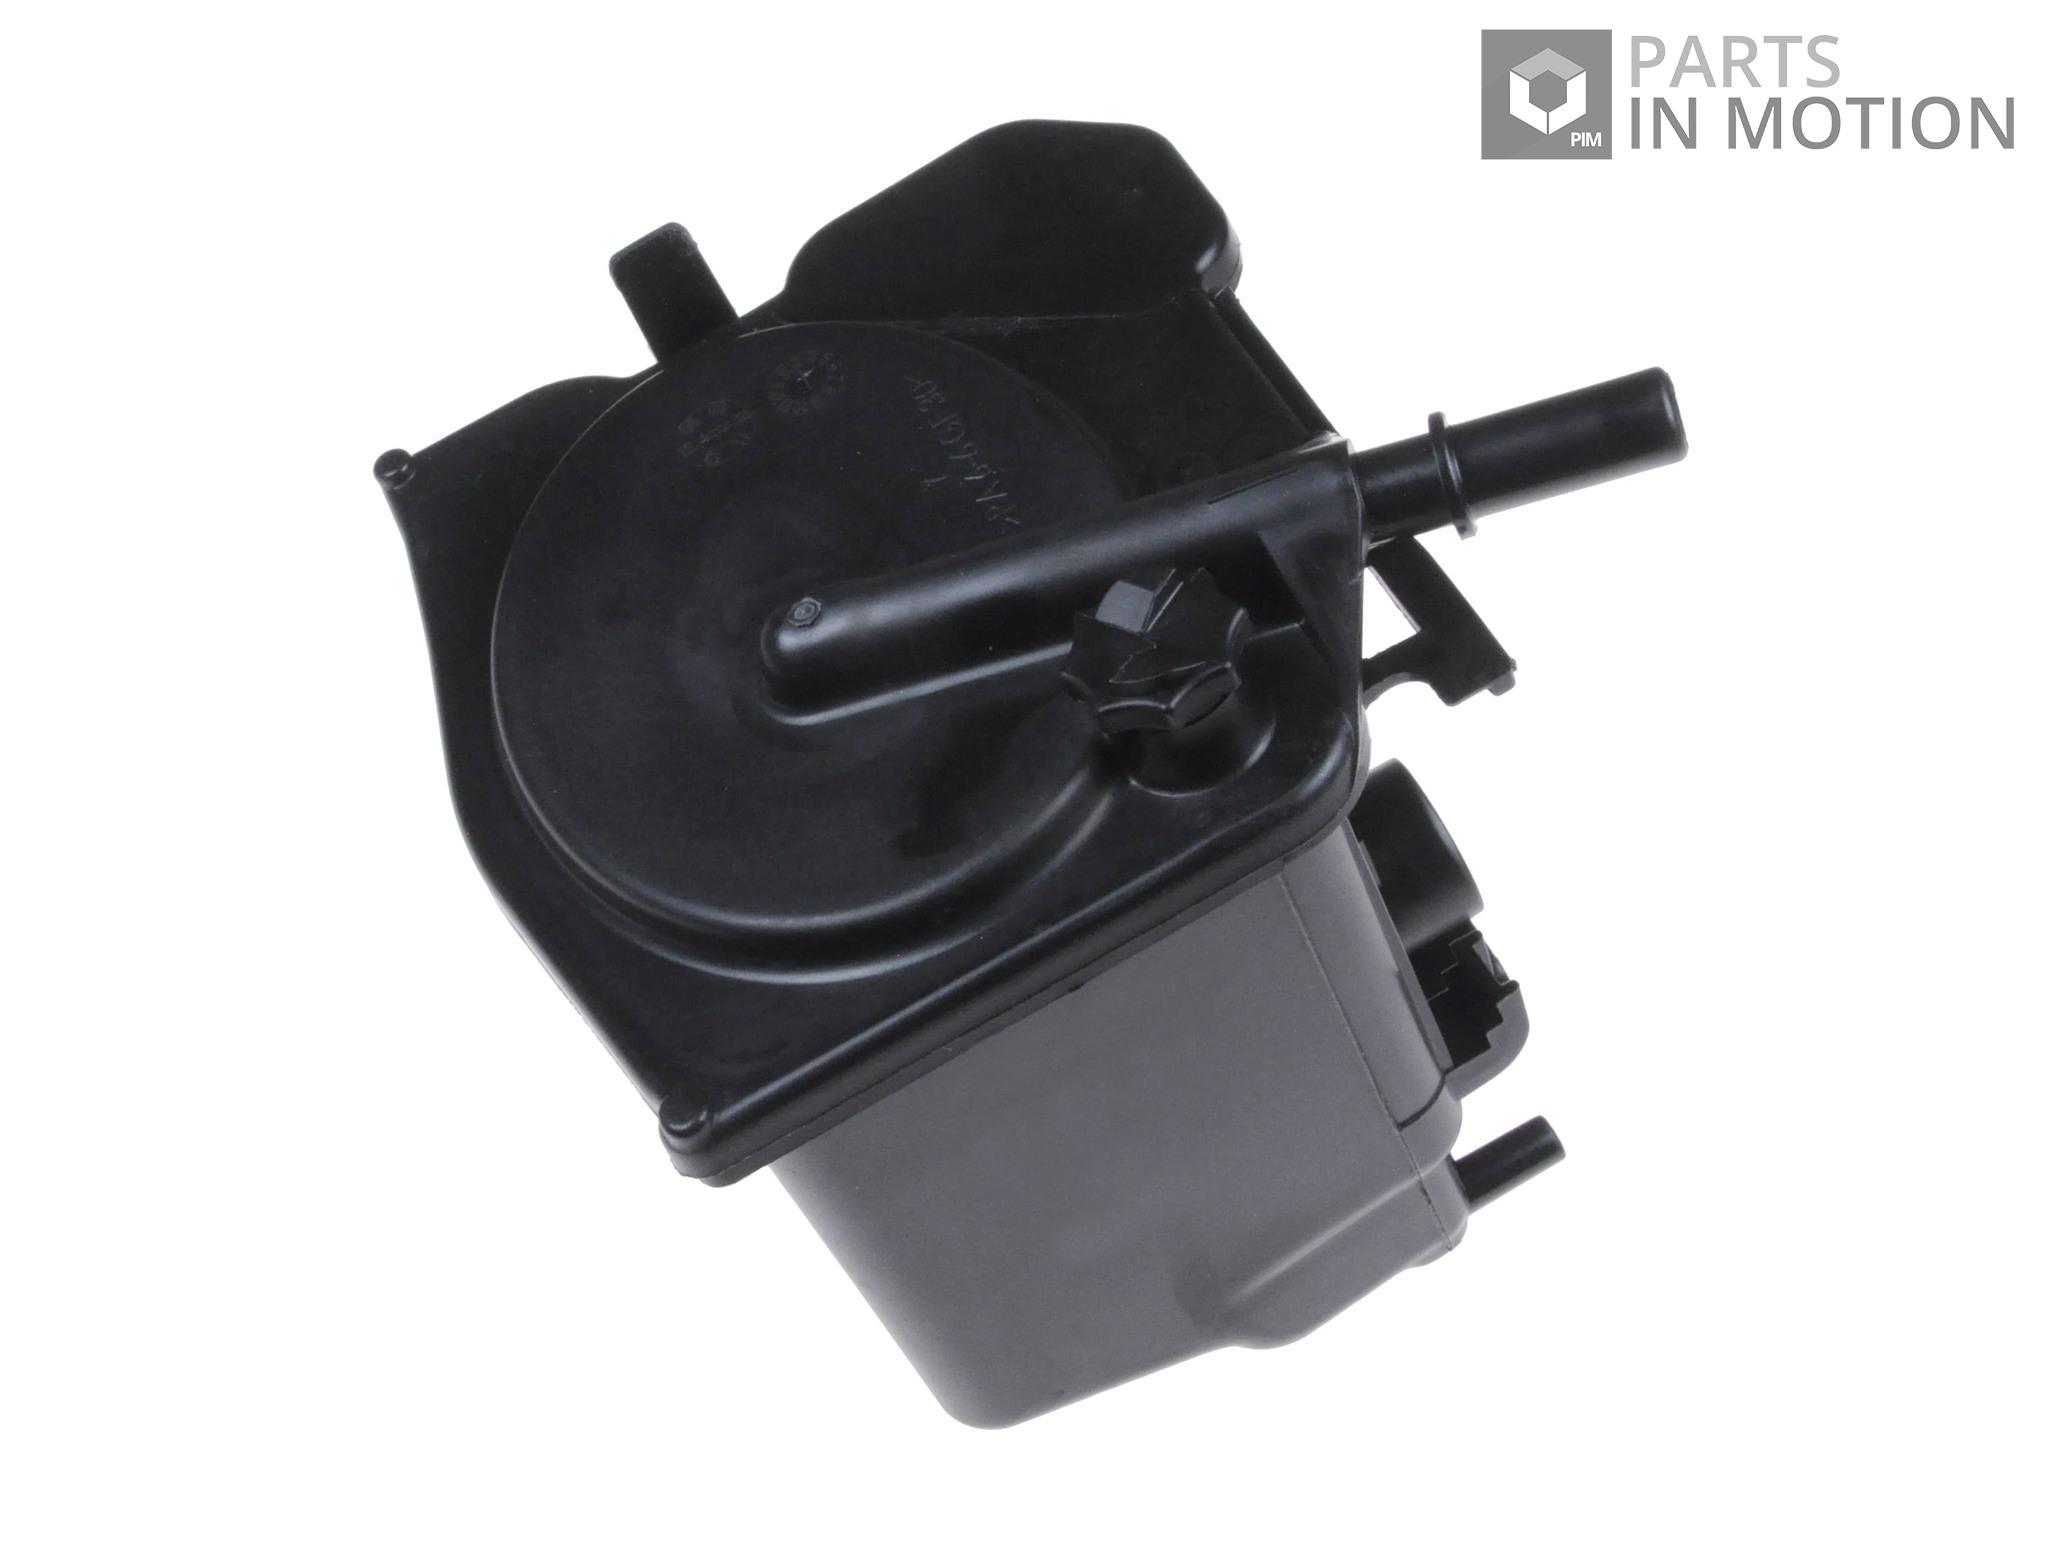 Fuel Filter Fits Mini Cooper 16d 06 To 10 9hz Adl 13327804958 S Blue Print Adm52339 3